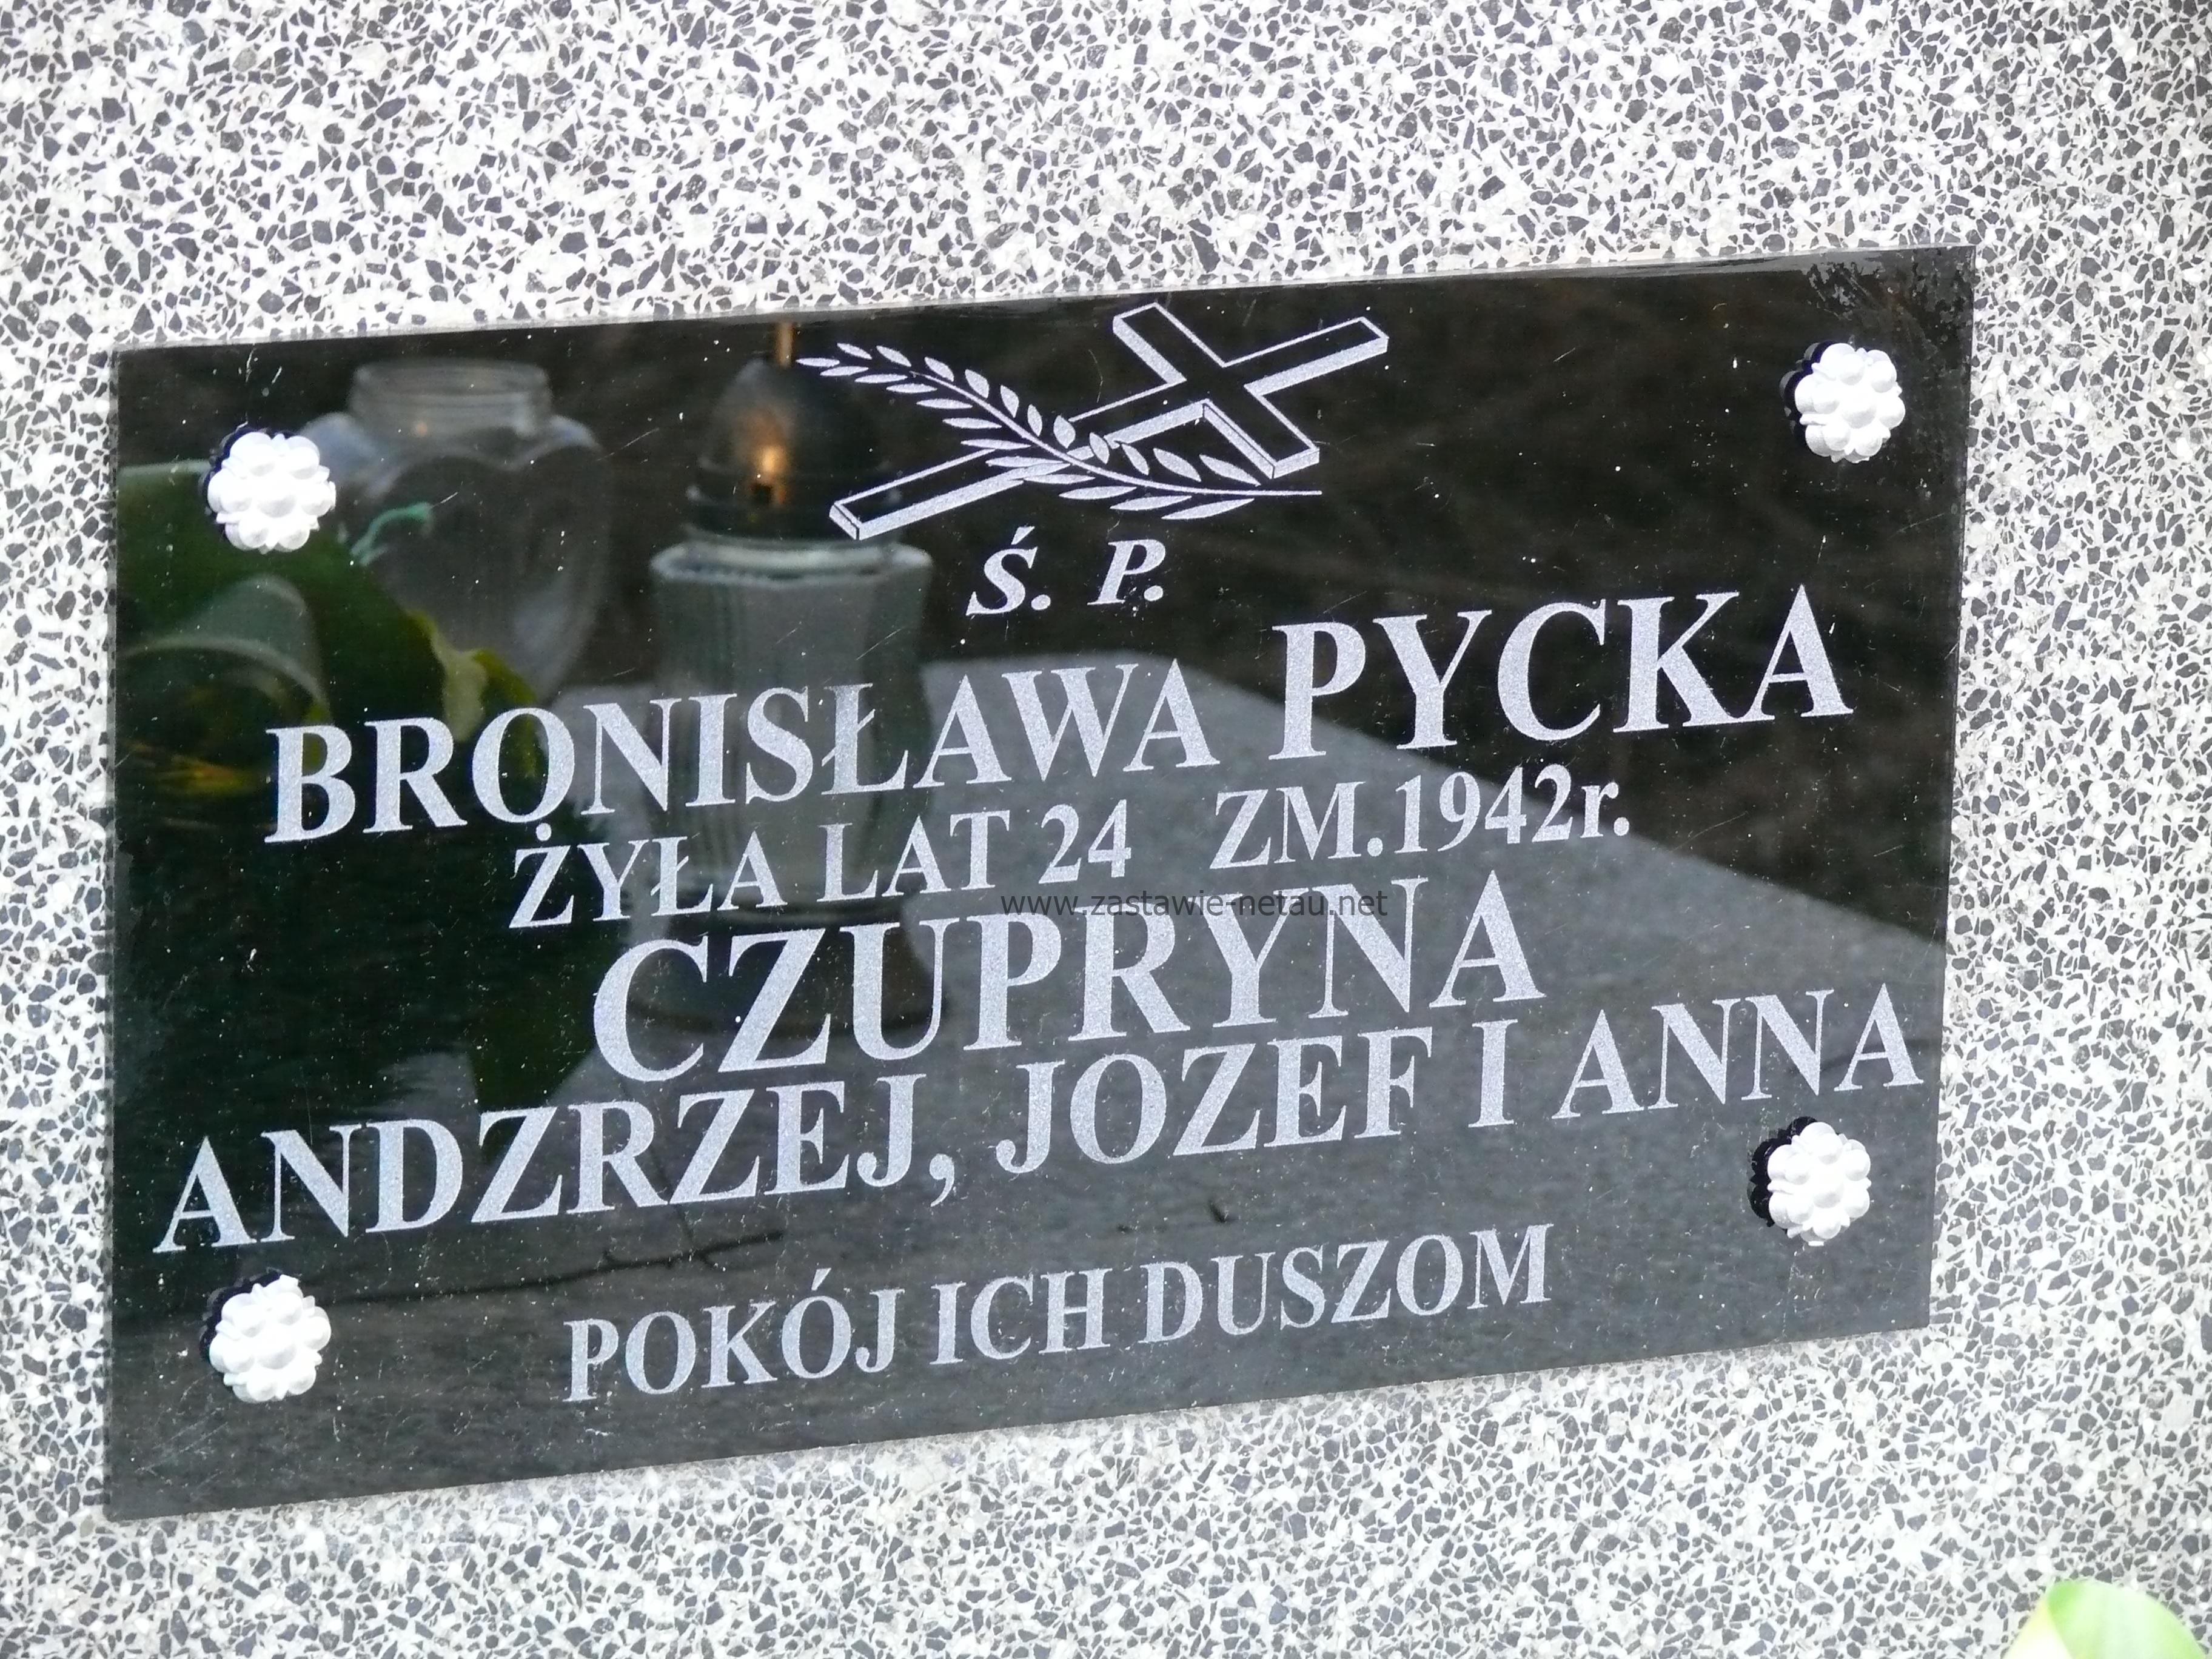 P1330283.JPG